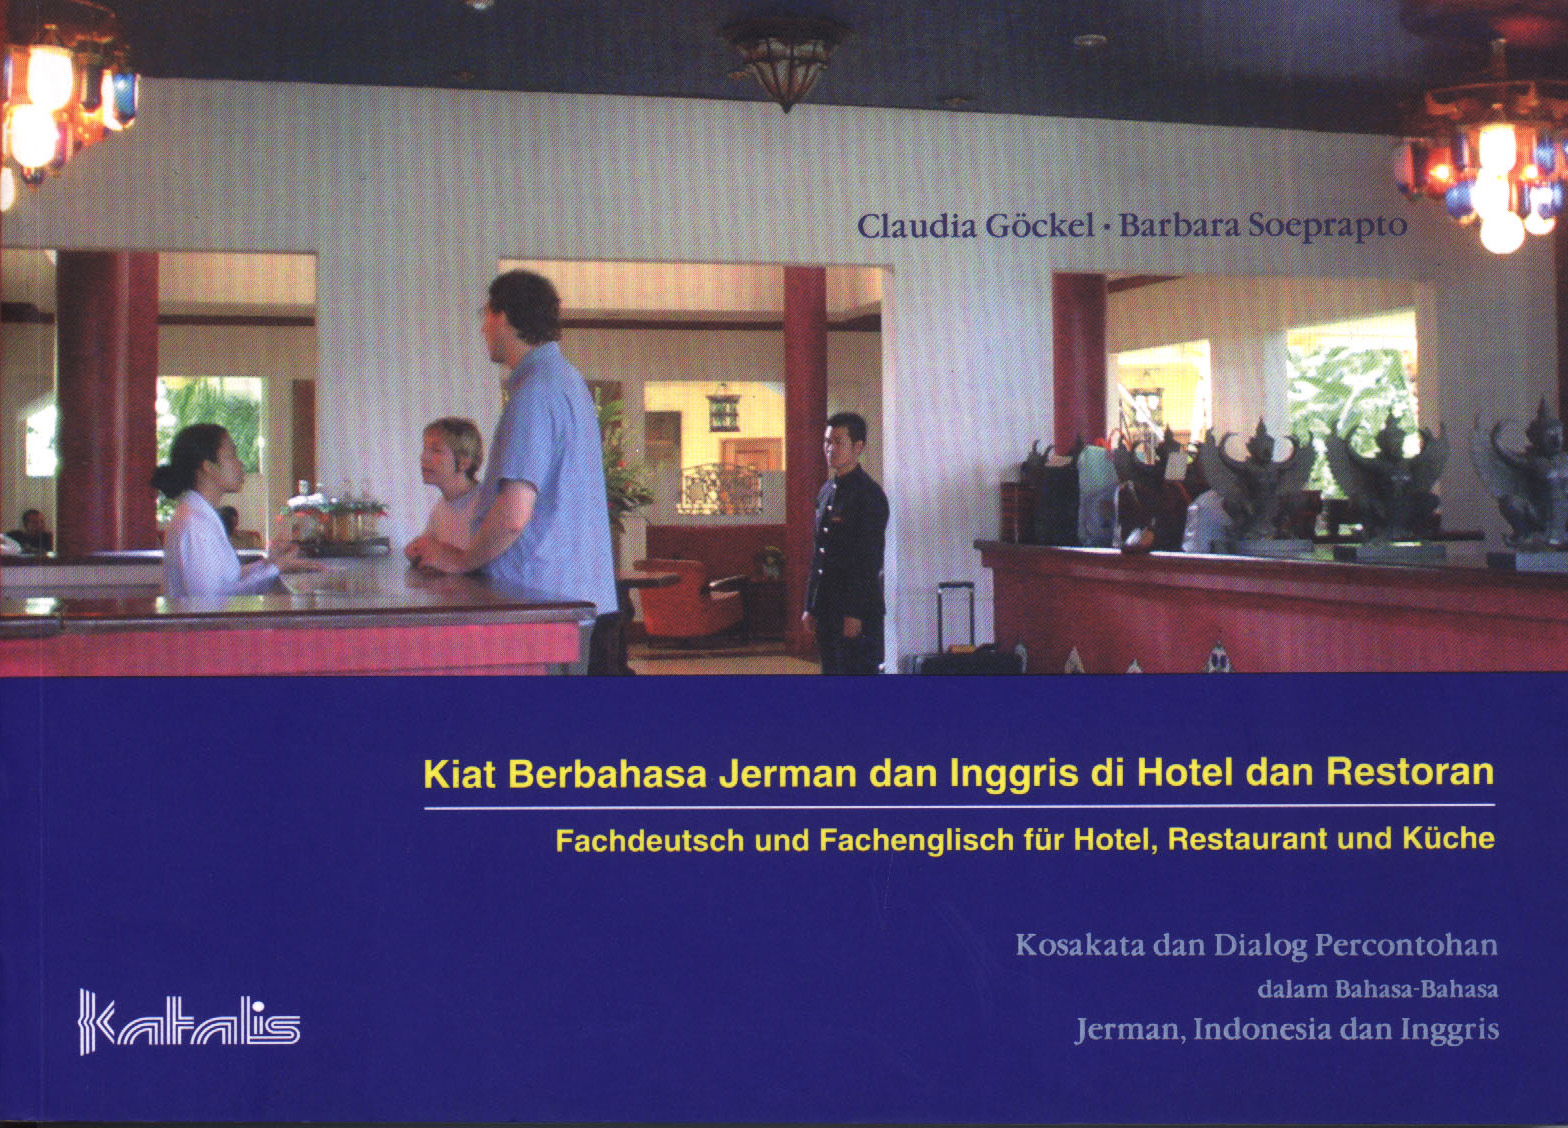 Kiat Berbahasa Jerman dan Inggris di Hotel dan Restoran